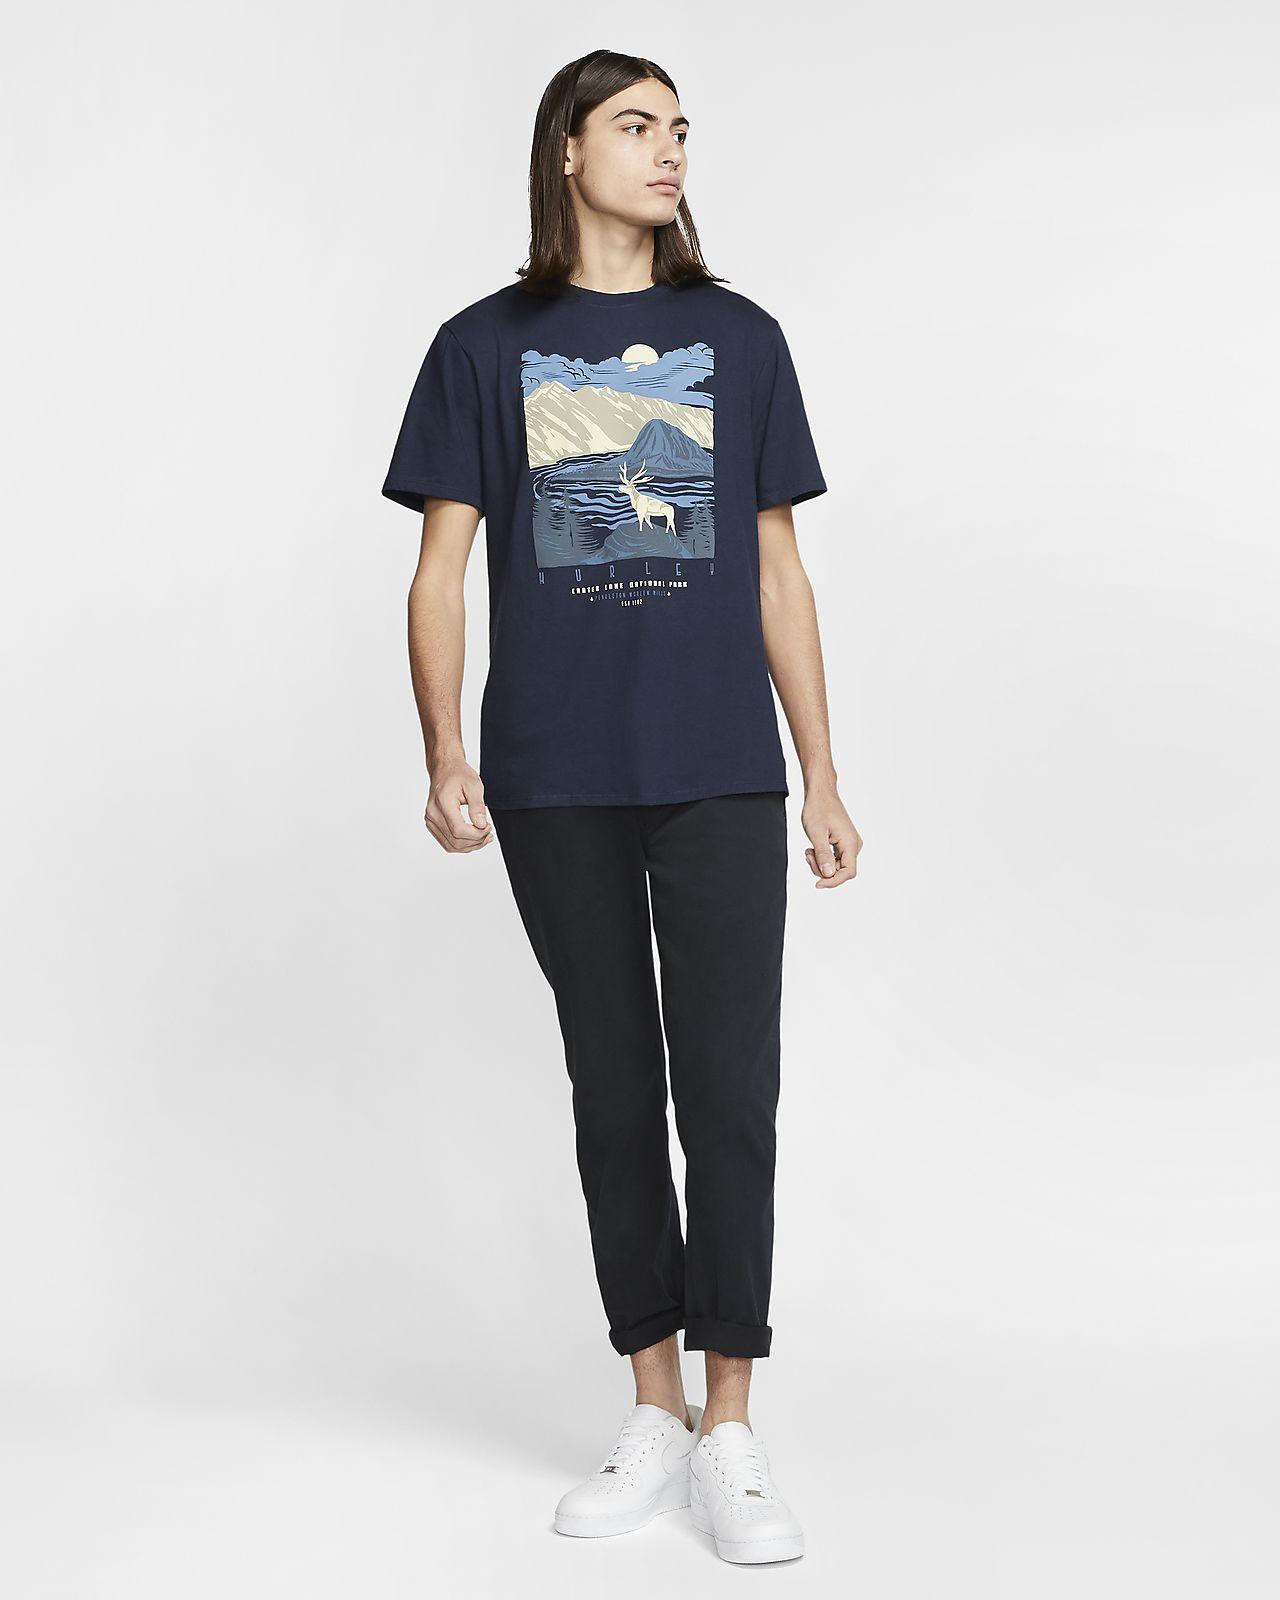 Hurley x Pendleton Crater Lake Men's T Shirt